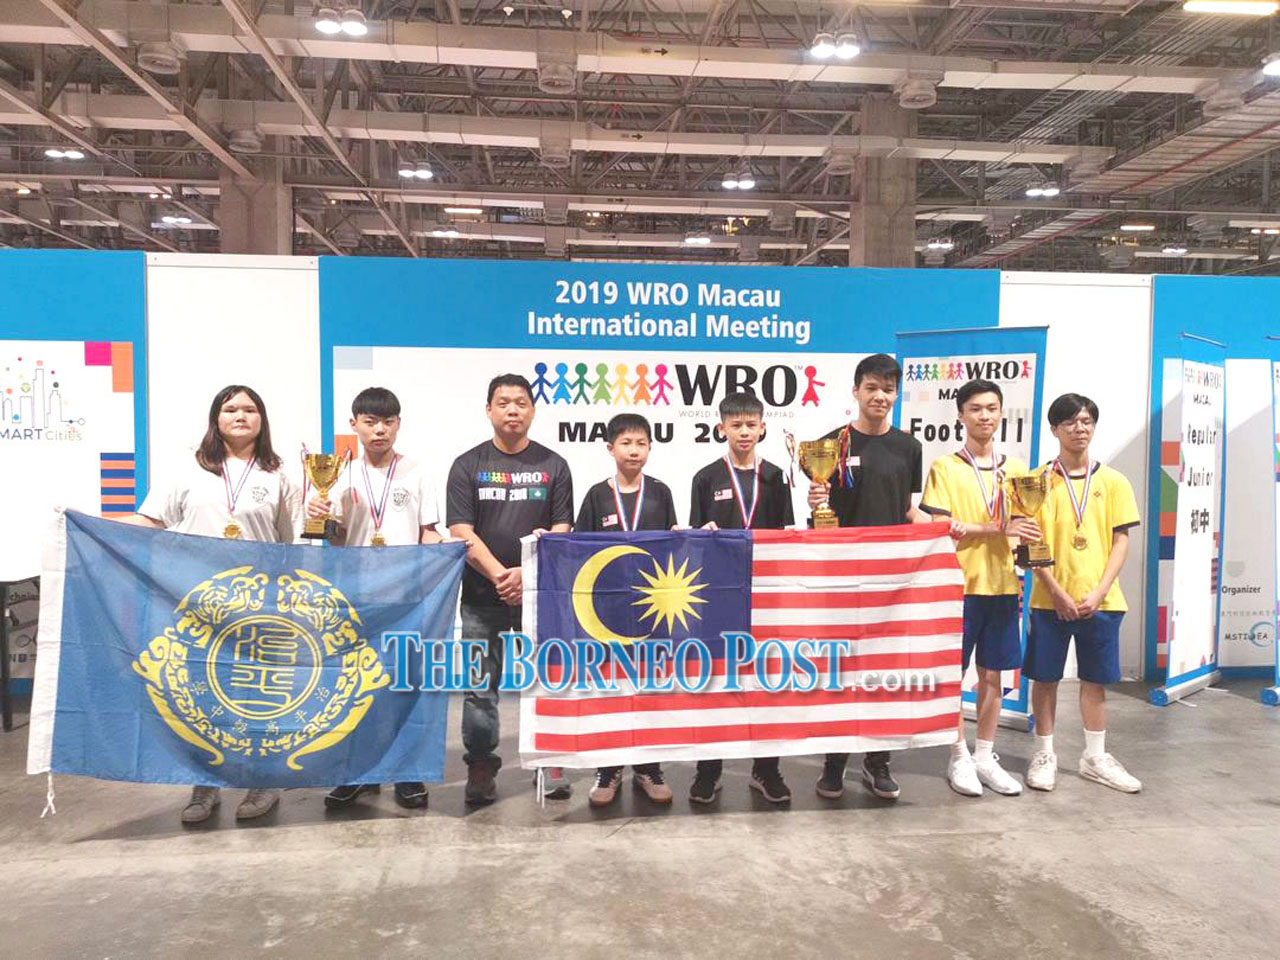 SMK Chung Hua Miri team champs at World Robot Olympiad 2019 in Macau